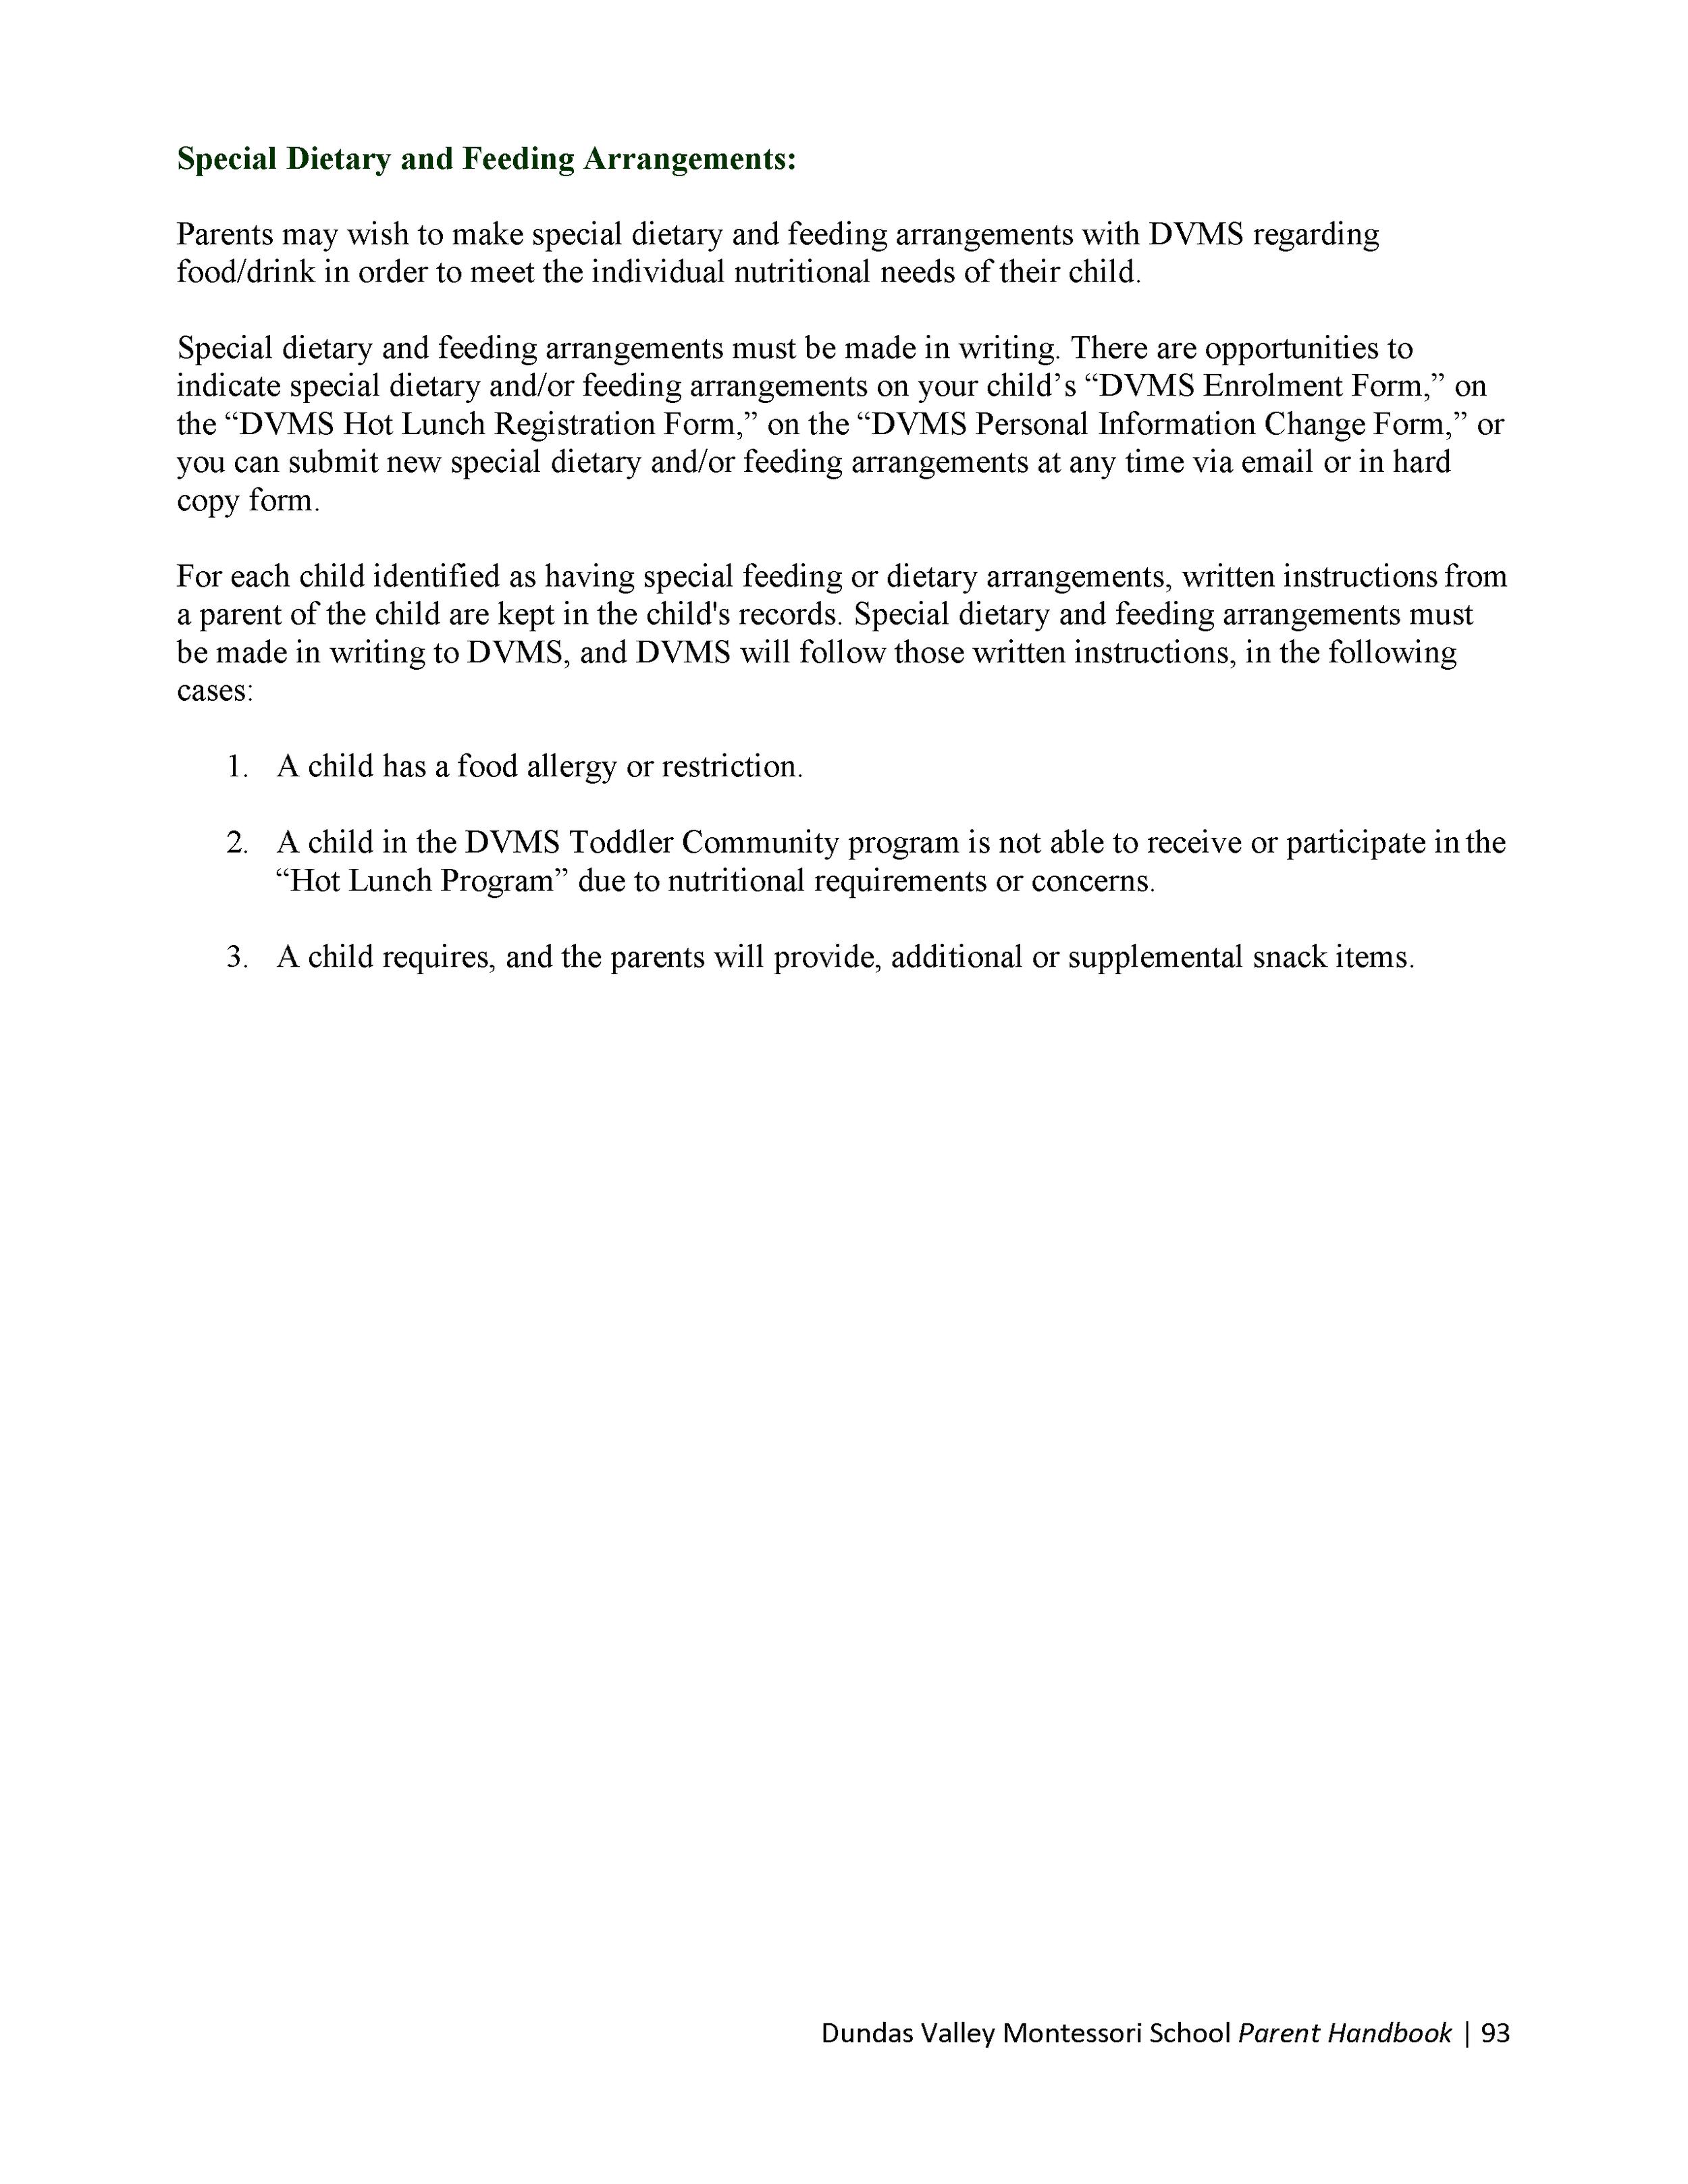 DVMS-Parent-Handbook-19-20_Page_095.png